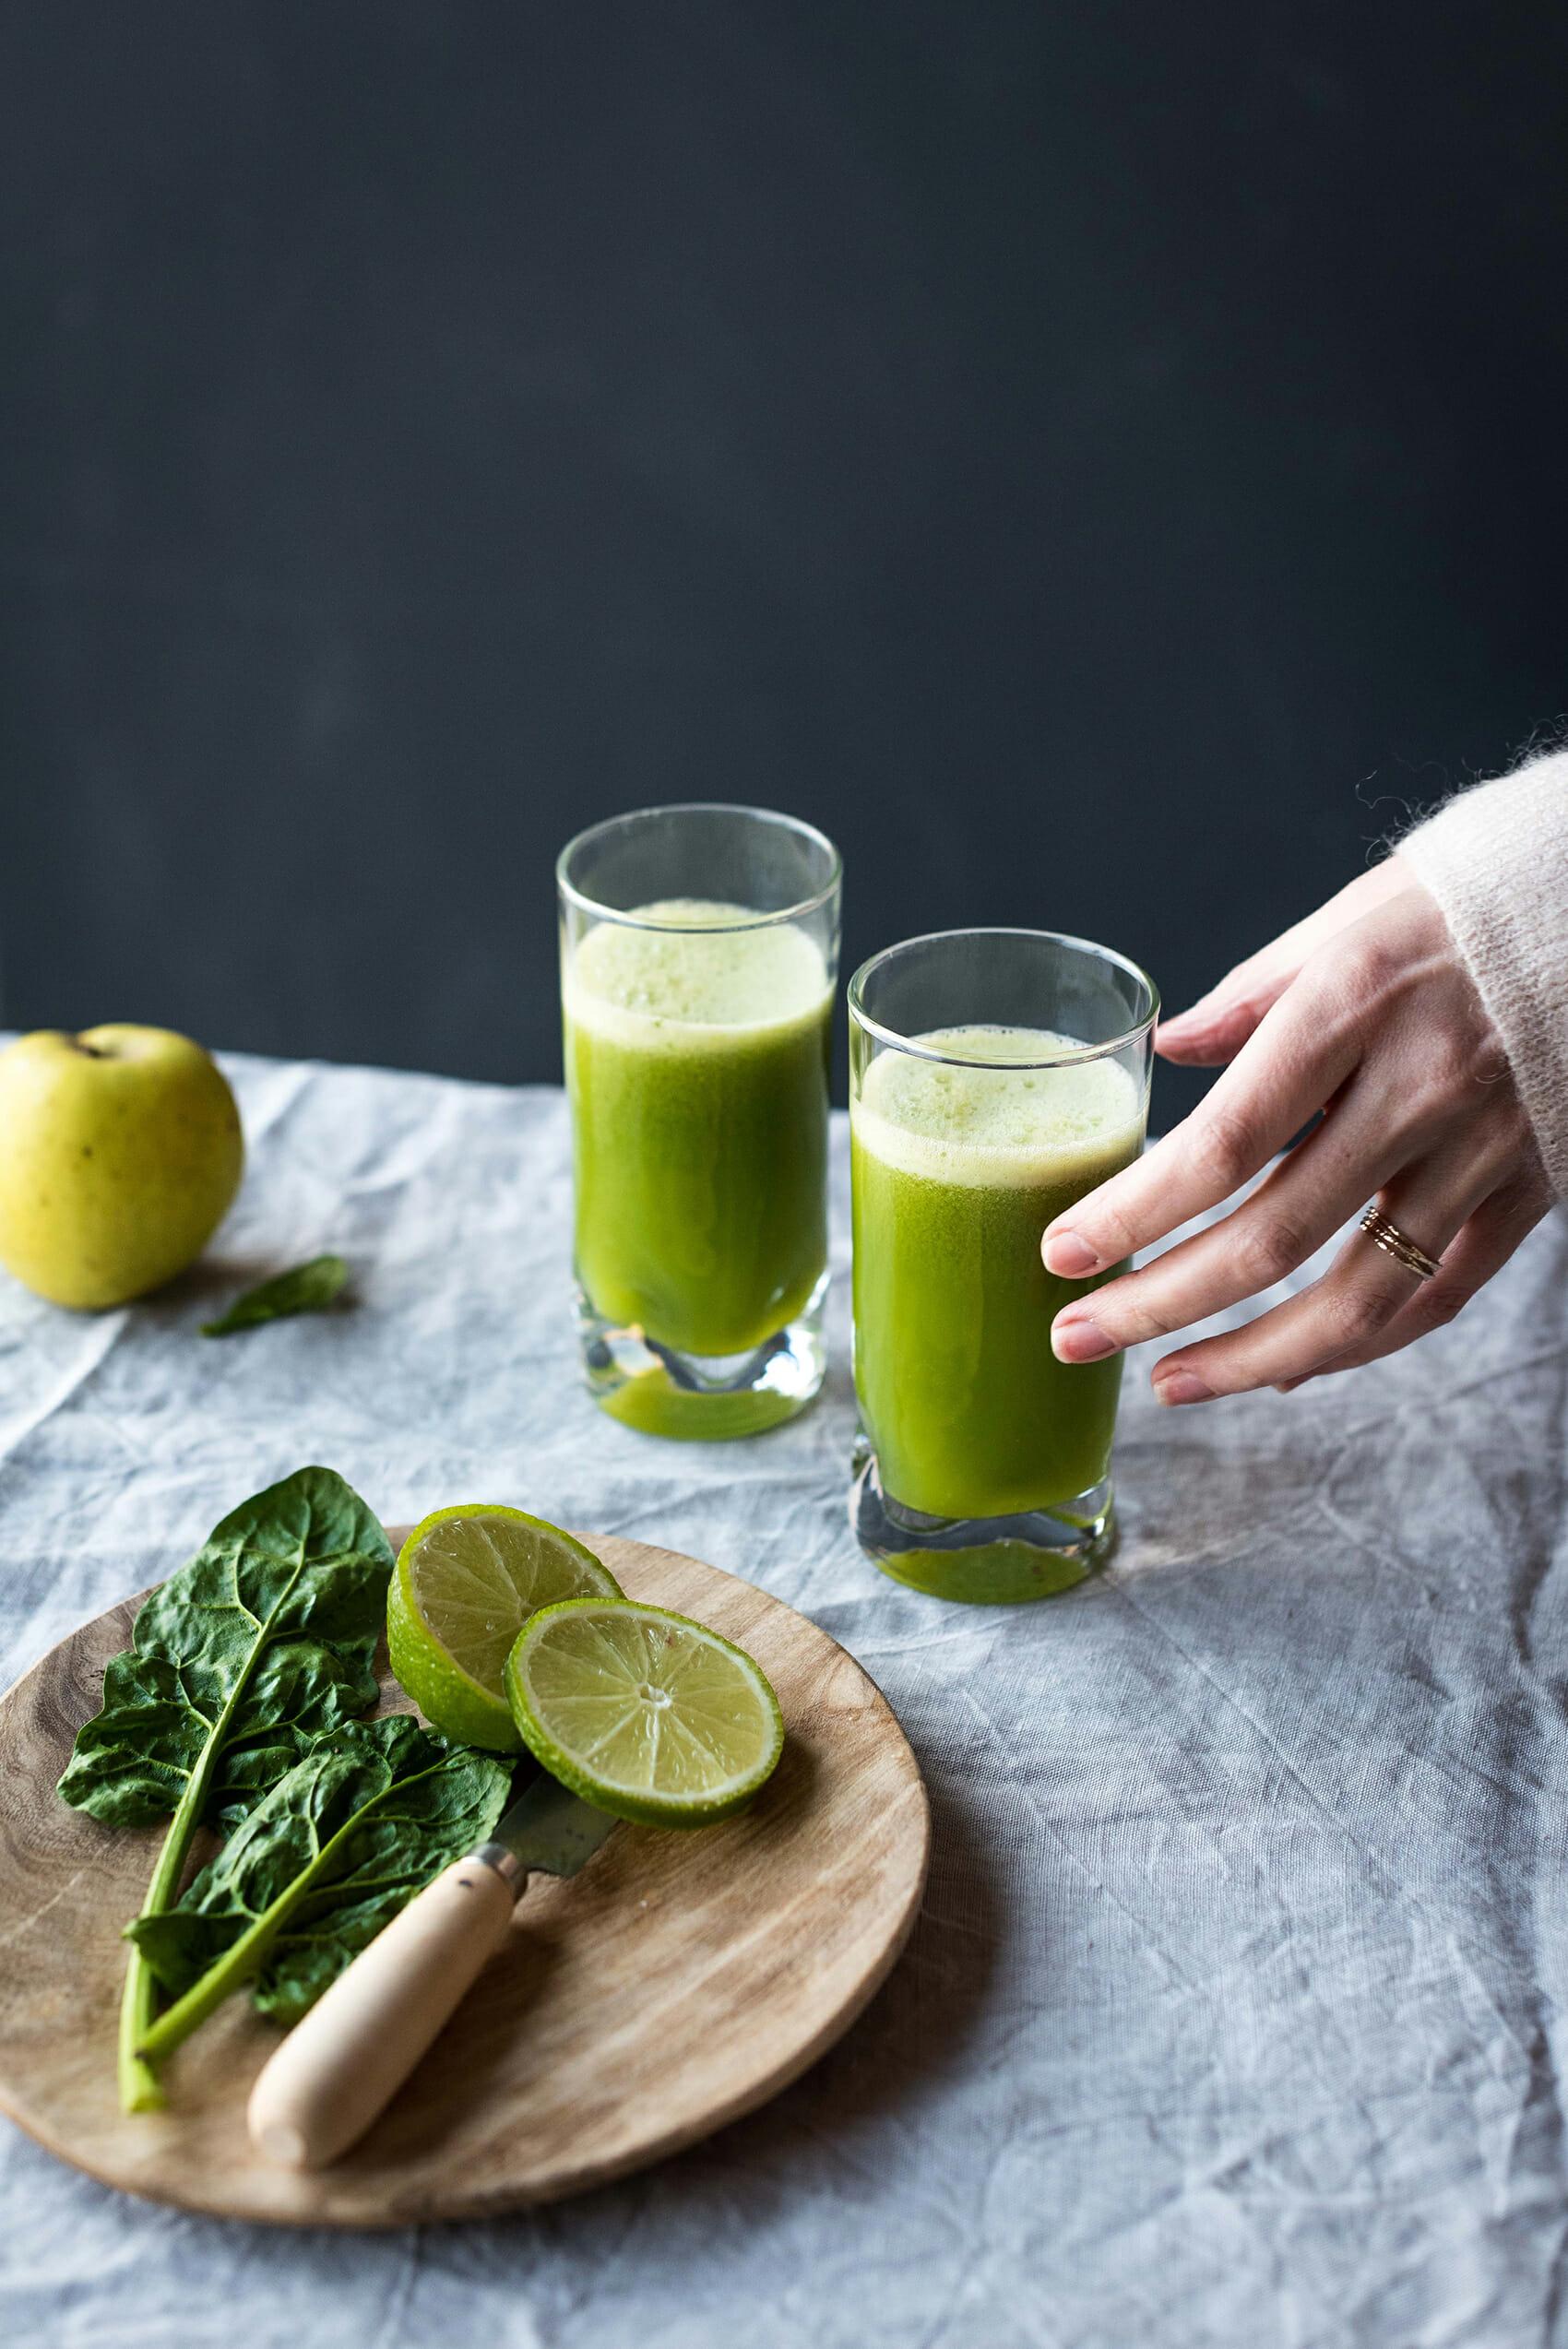 Jus vert green juice - Lilie Bakery